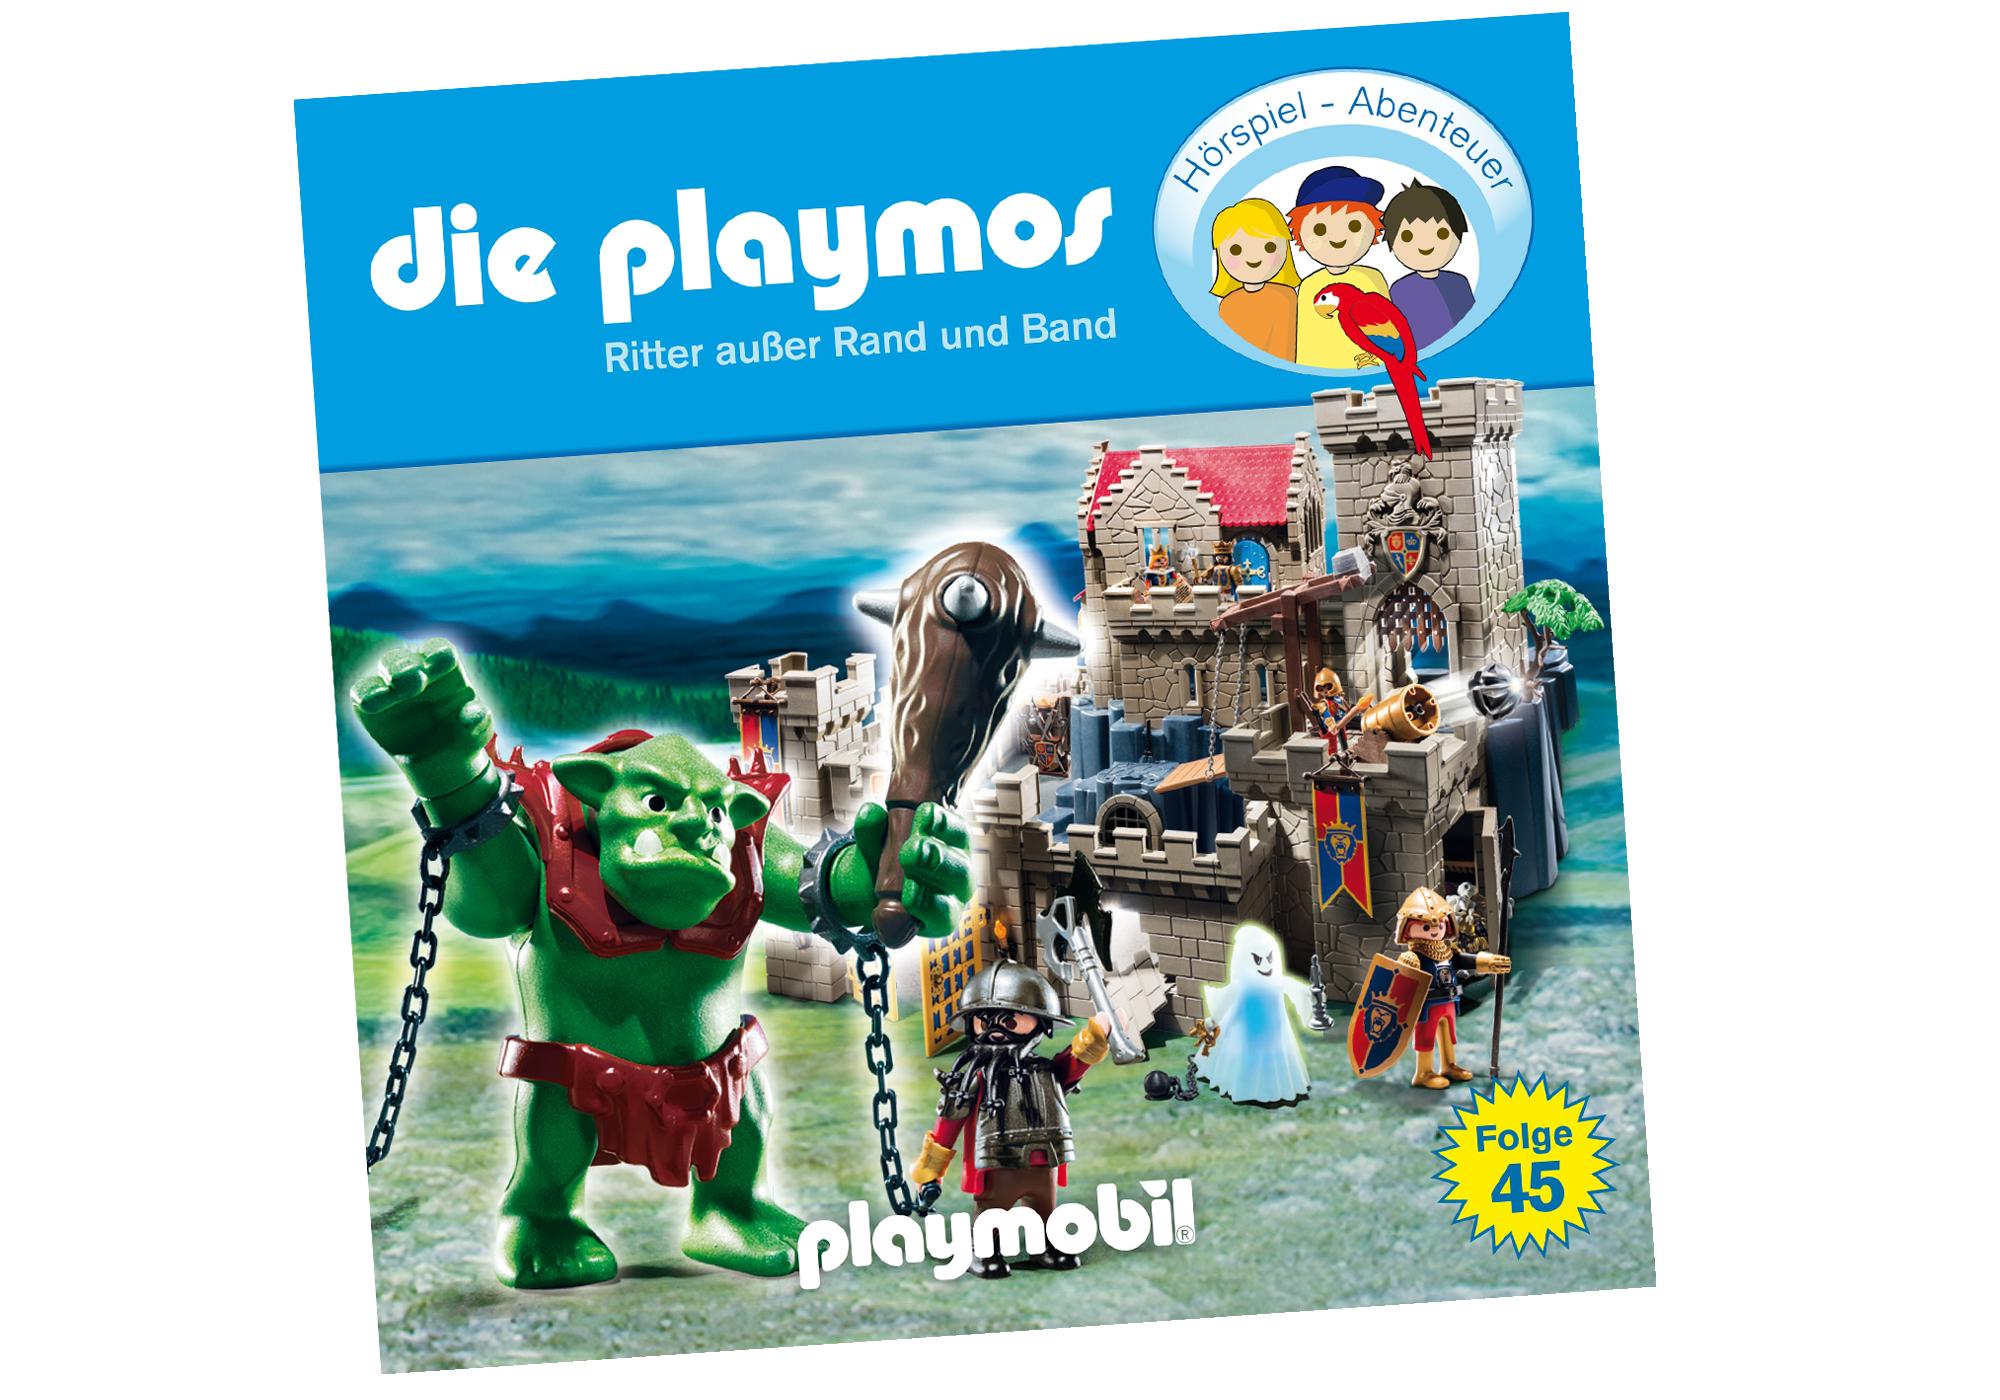 http://media.playmobil.com/i/playmobil/80458_product_detail